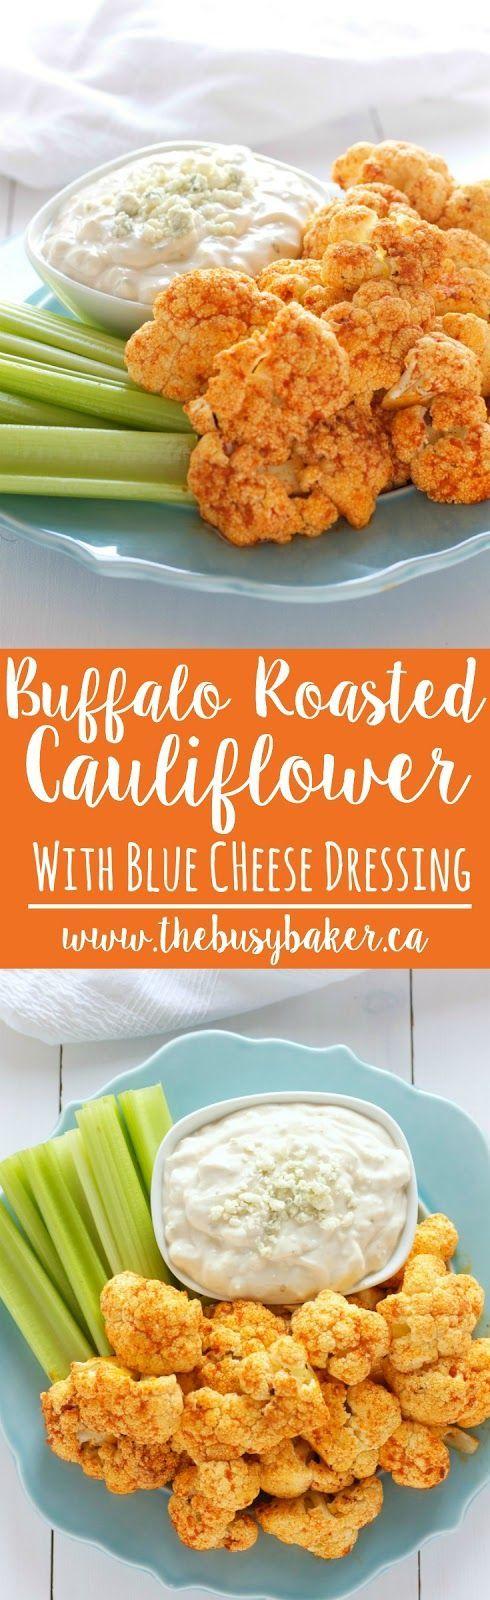 Buffalo Roasted Turkey With Blue Cheese Sauce Recipe — Dishmaps